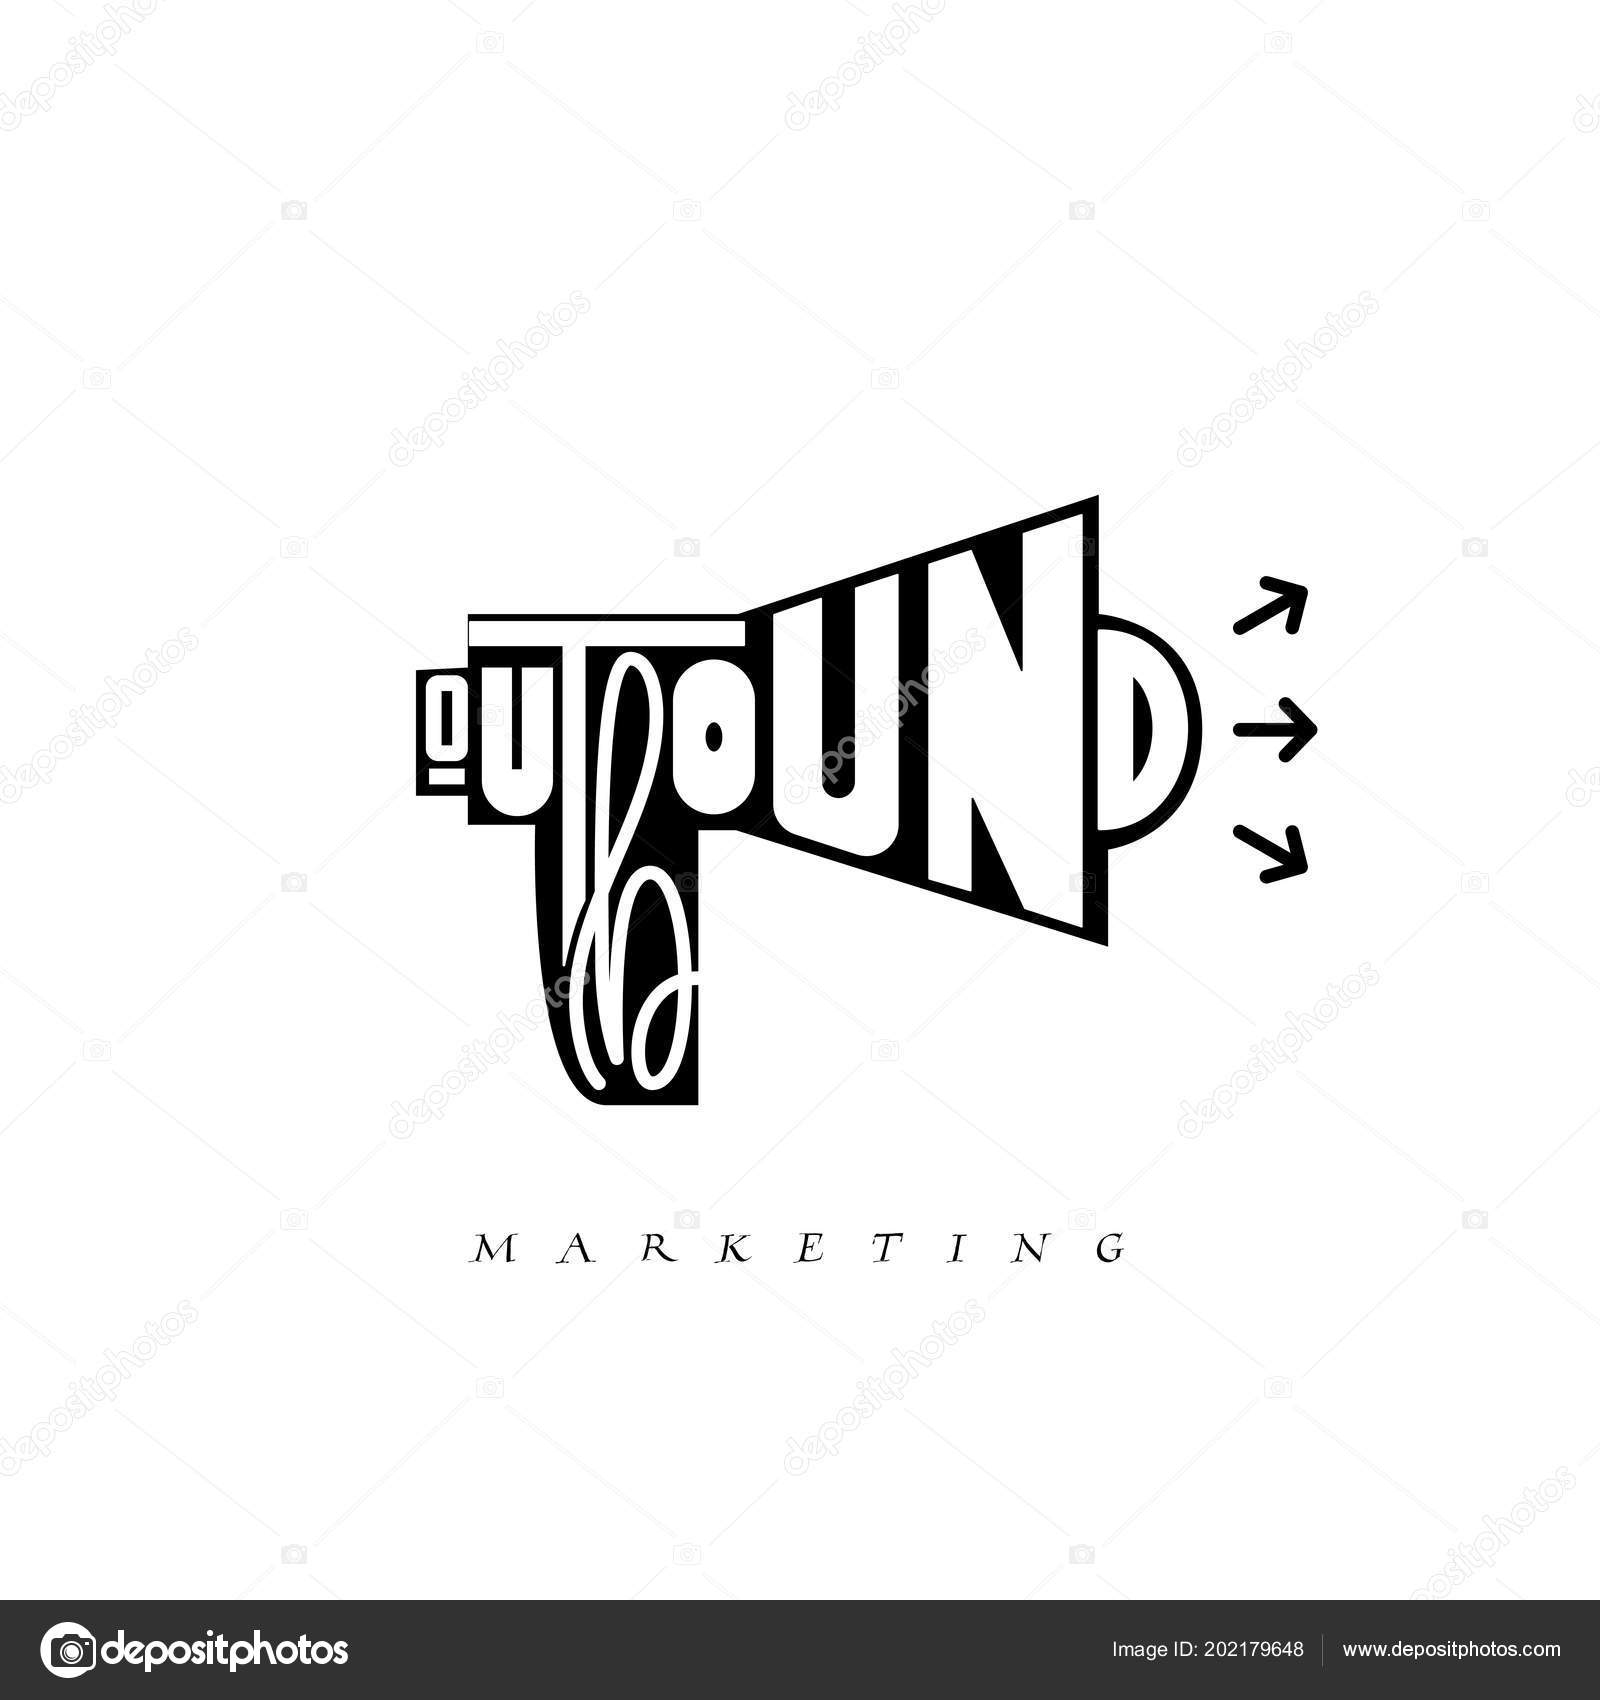 outbound marketing concept vector business illustration offline or interruption marketing background stock vector c zao4nik 202179648 depositphotos